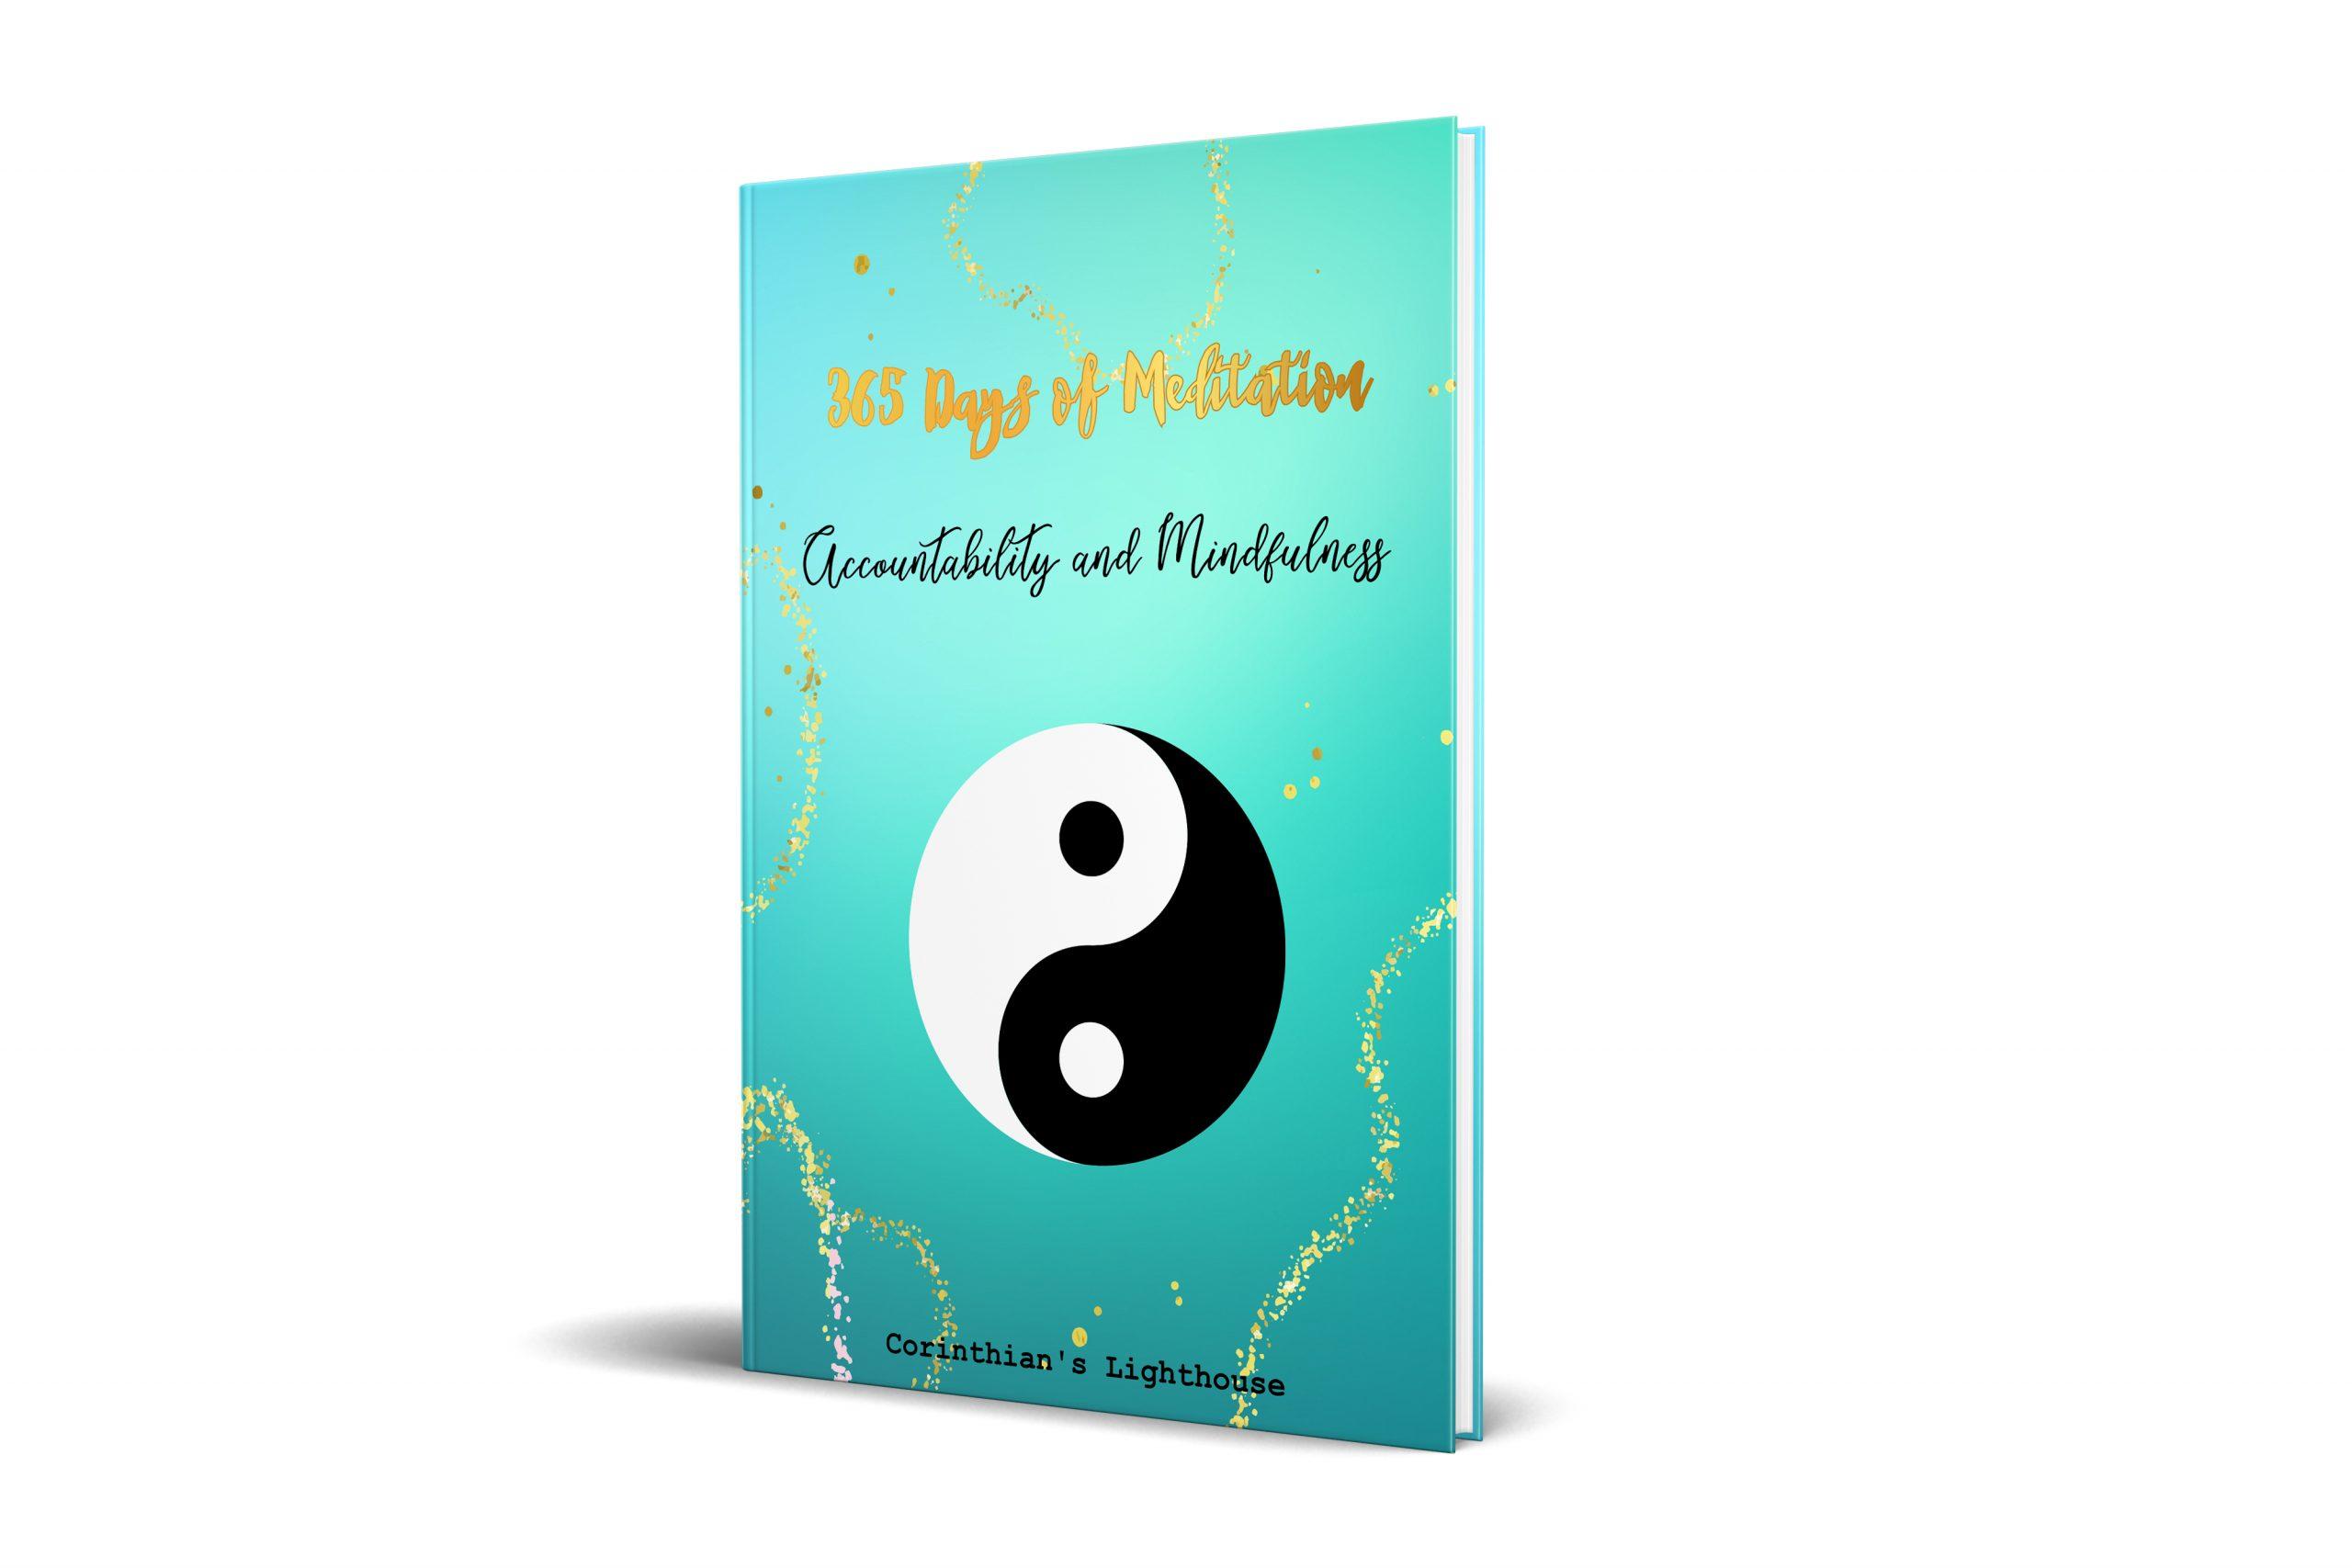 365 Days of Meditation Journal Personalized Copy